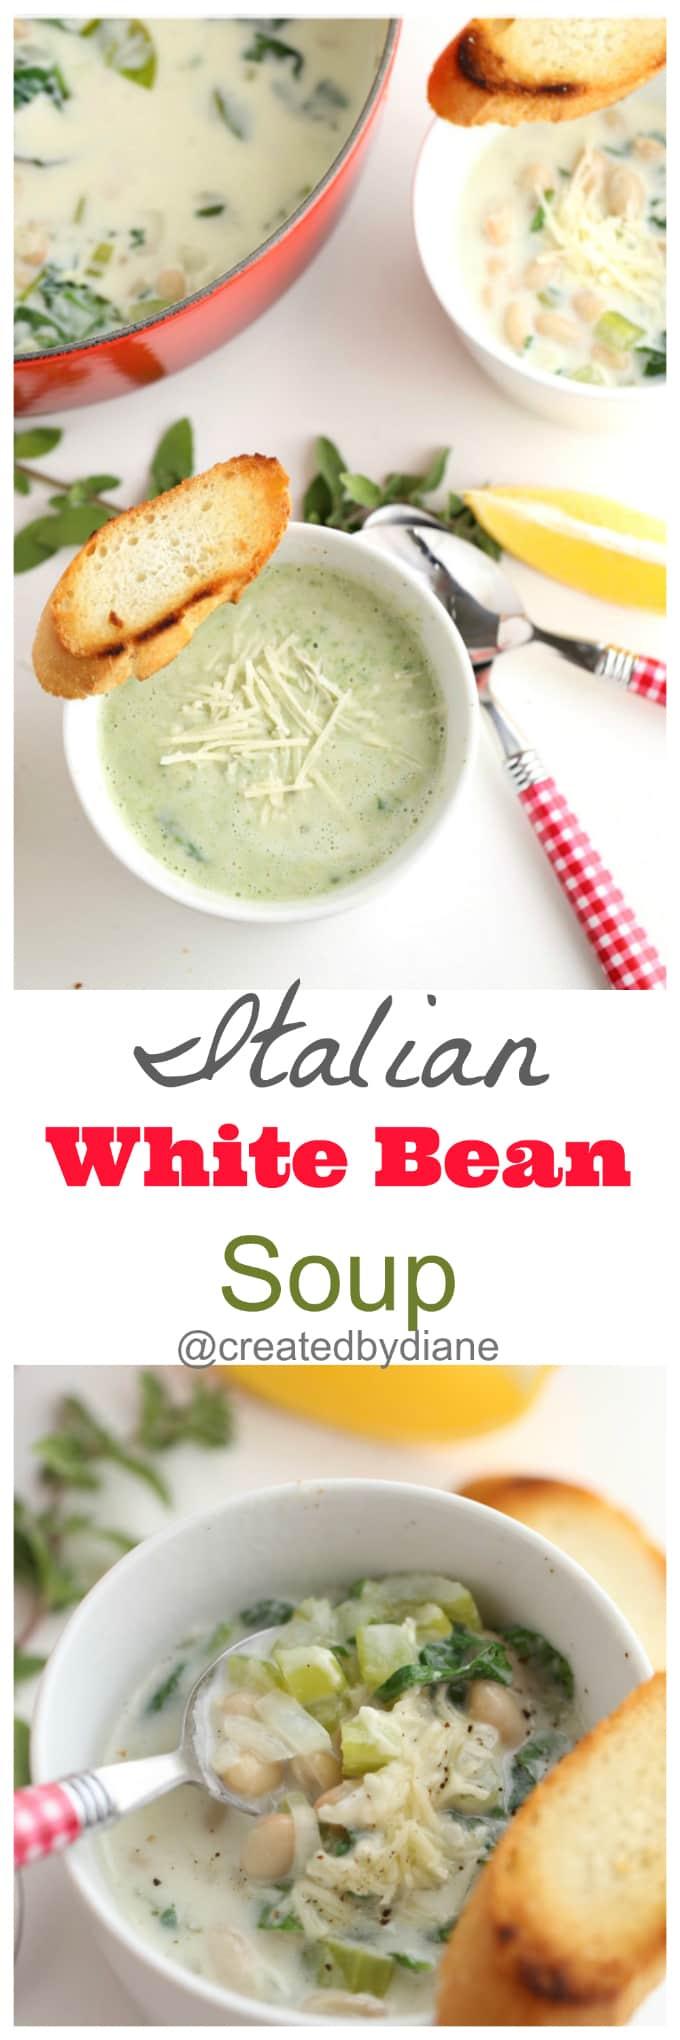 Italian White Bean Soup Recipe with Lemon from @createdbydiane